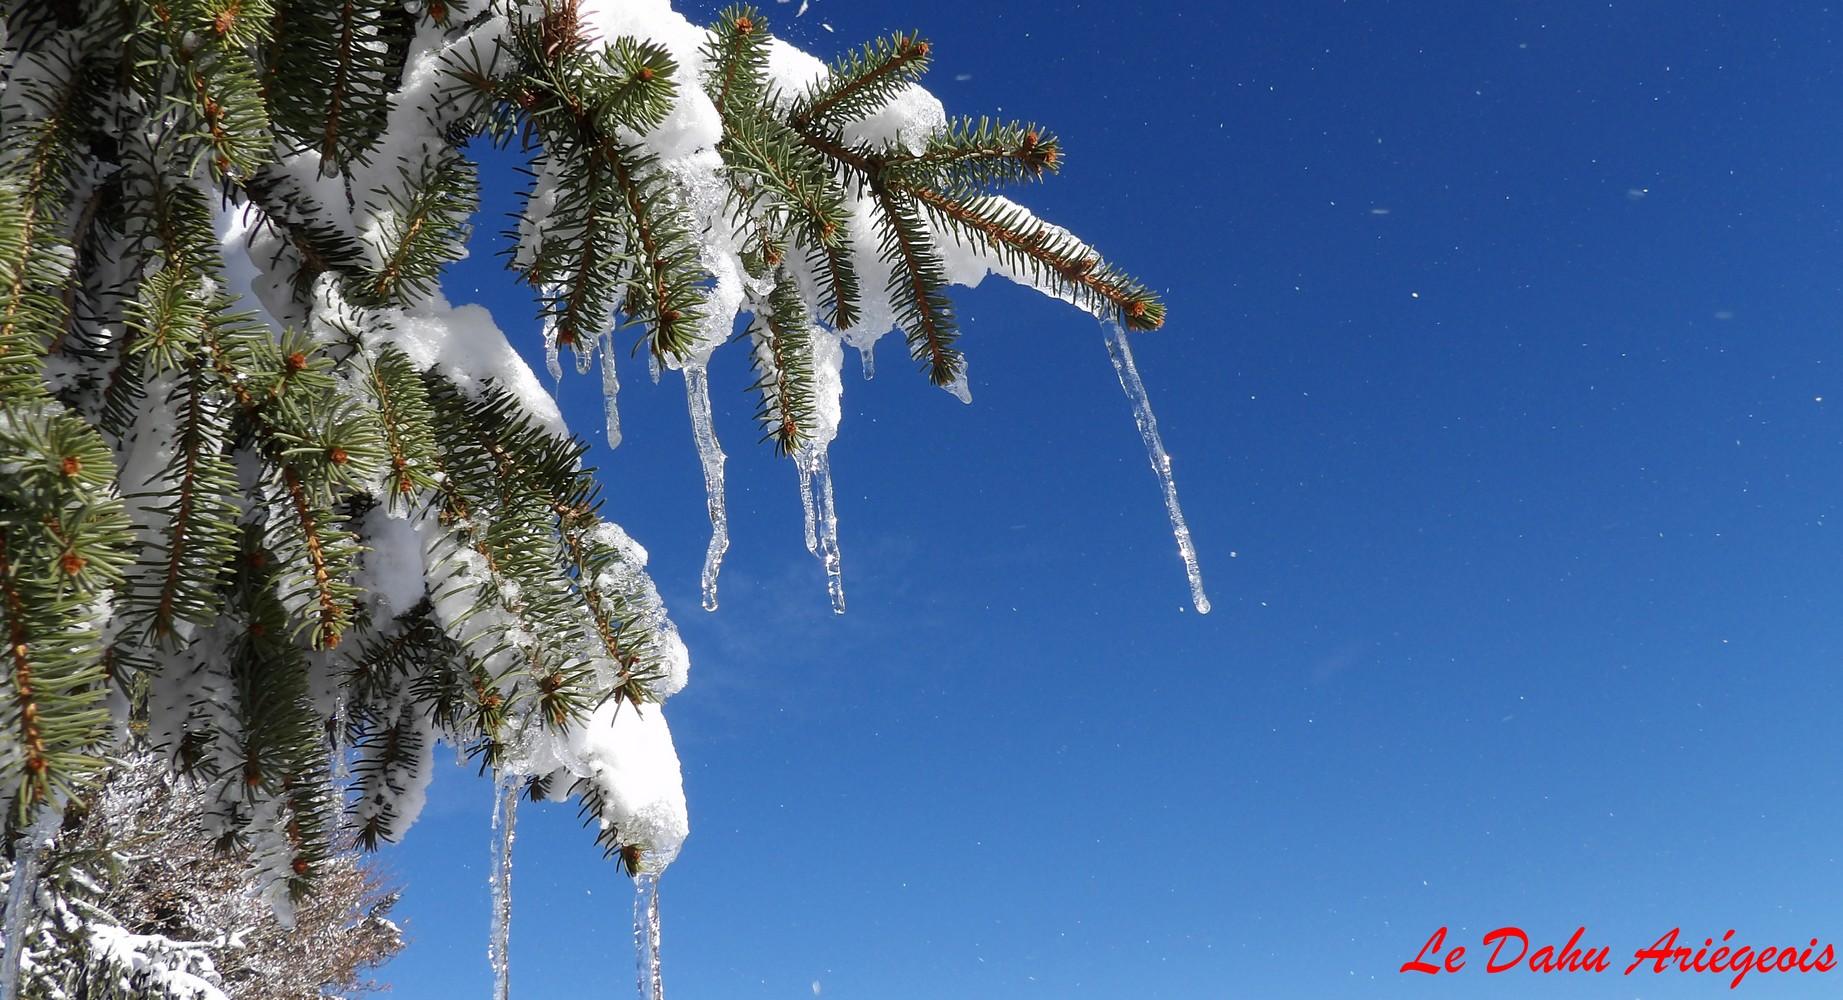 Raquettes a neige - Paysage Ariege 7